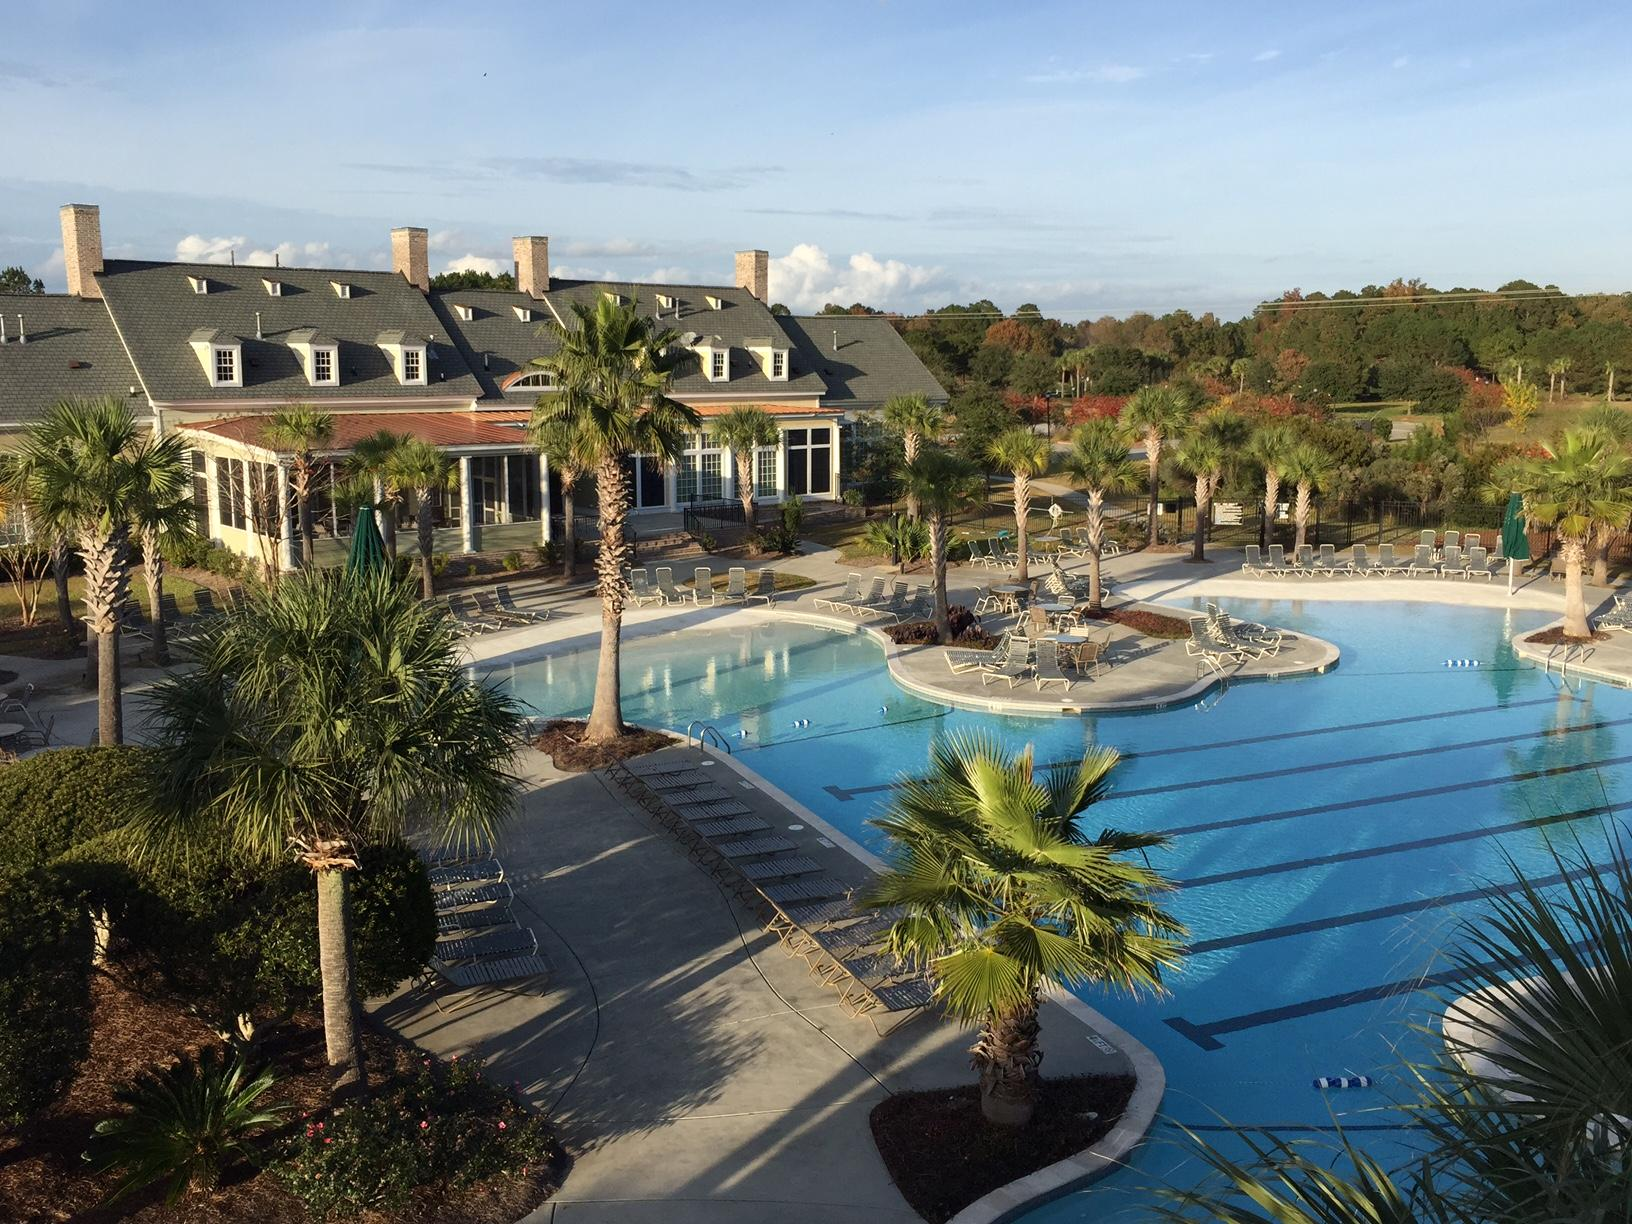 Oak Bluff Homes For Sale - 1104 Oak Bluff, Charleston, SC - 6